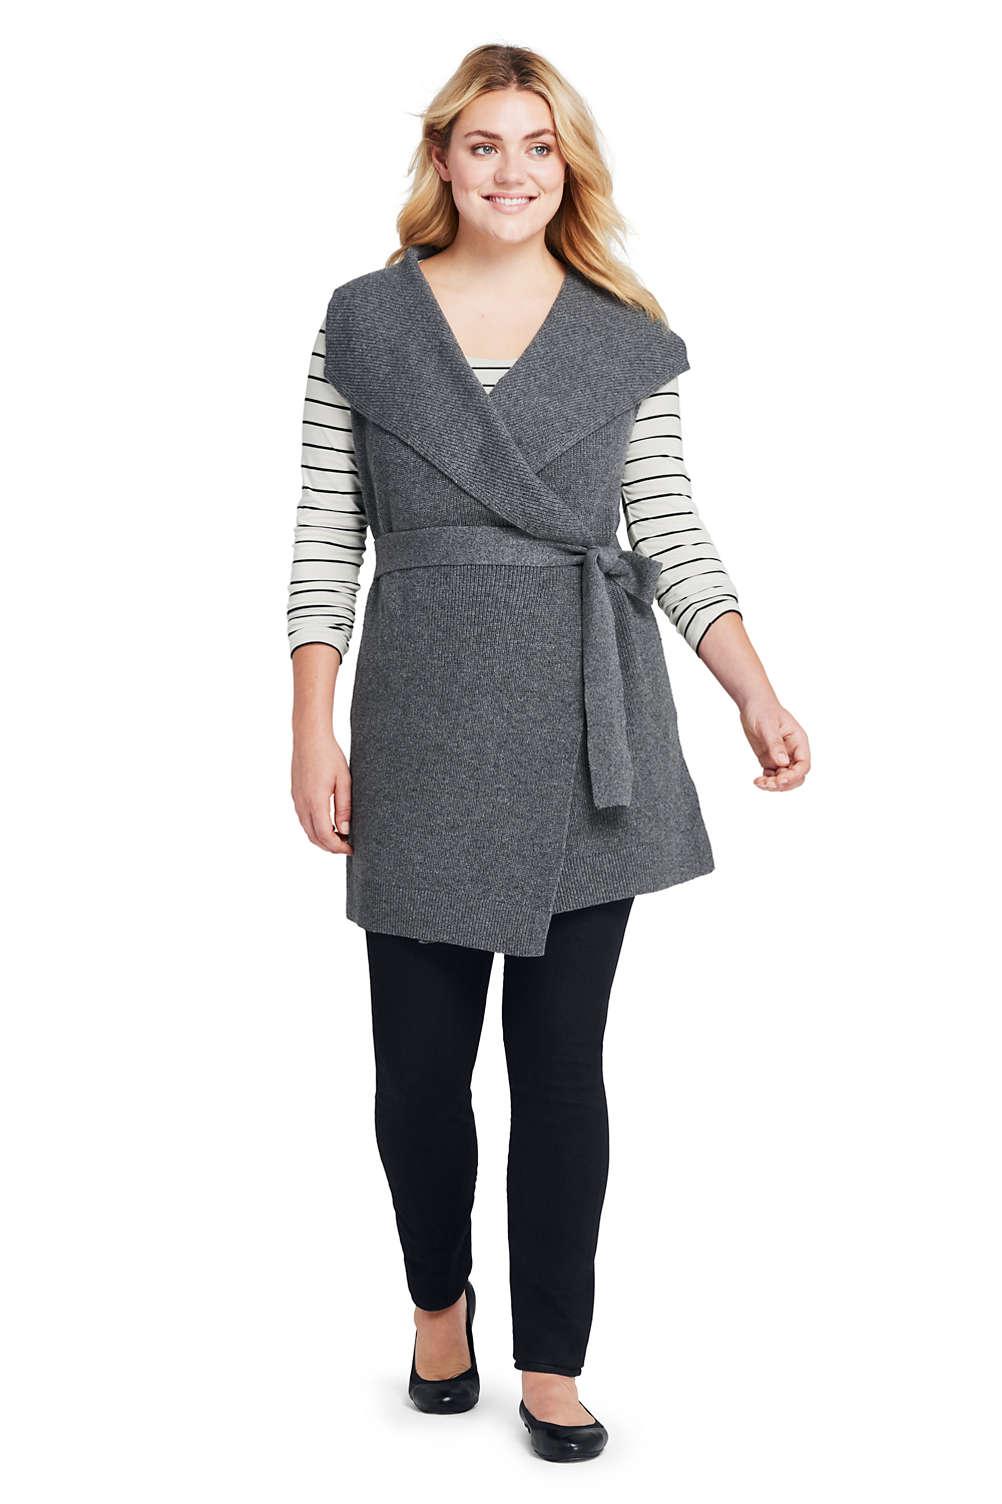 a1ffdb66663 Women s Plus Size Sleeveless Lofty Blend Tie Sweater Vest from Lands ...